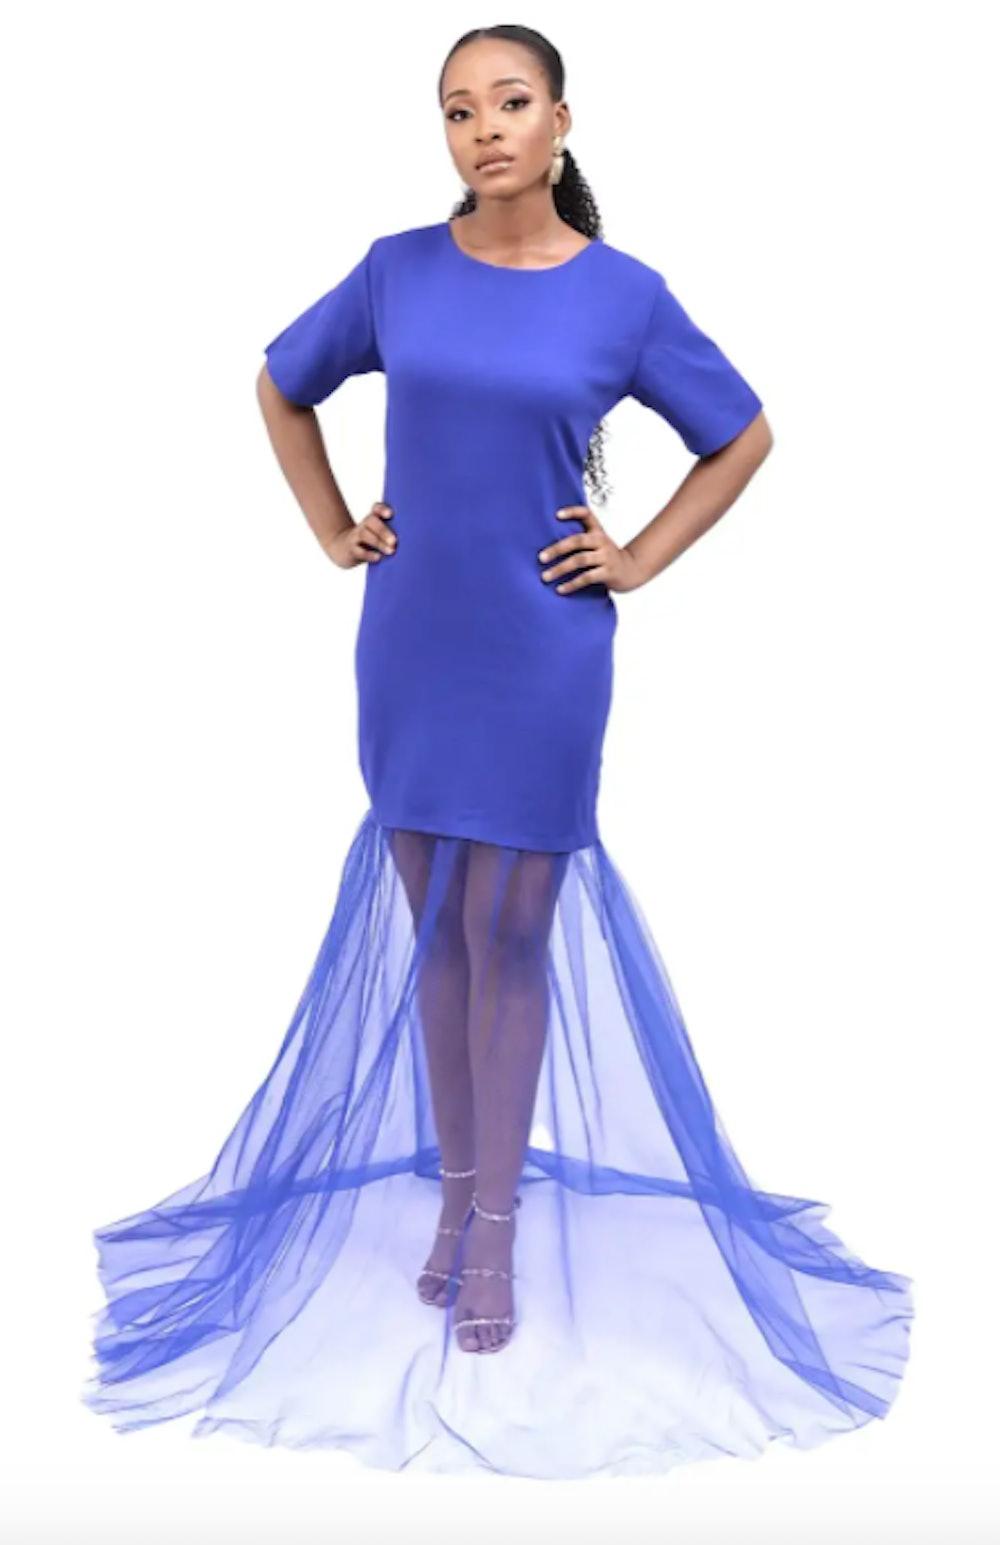 ROCOCO 'Calliope' Cobalt Tulle & Crepe Tee Shirt Dress